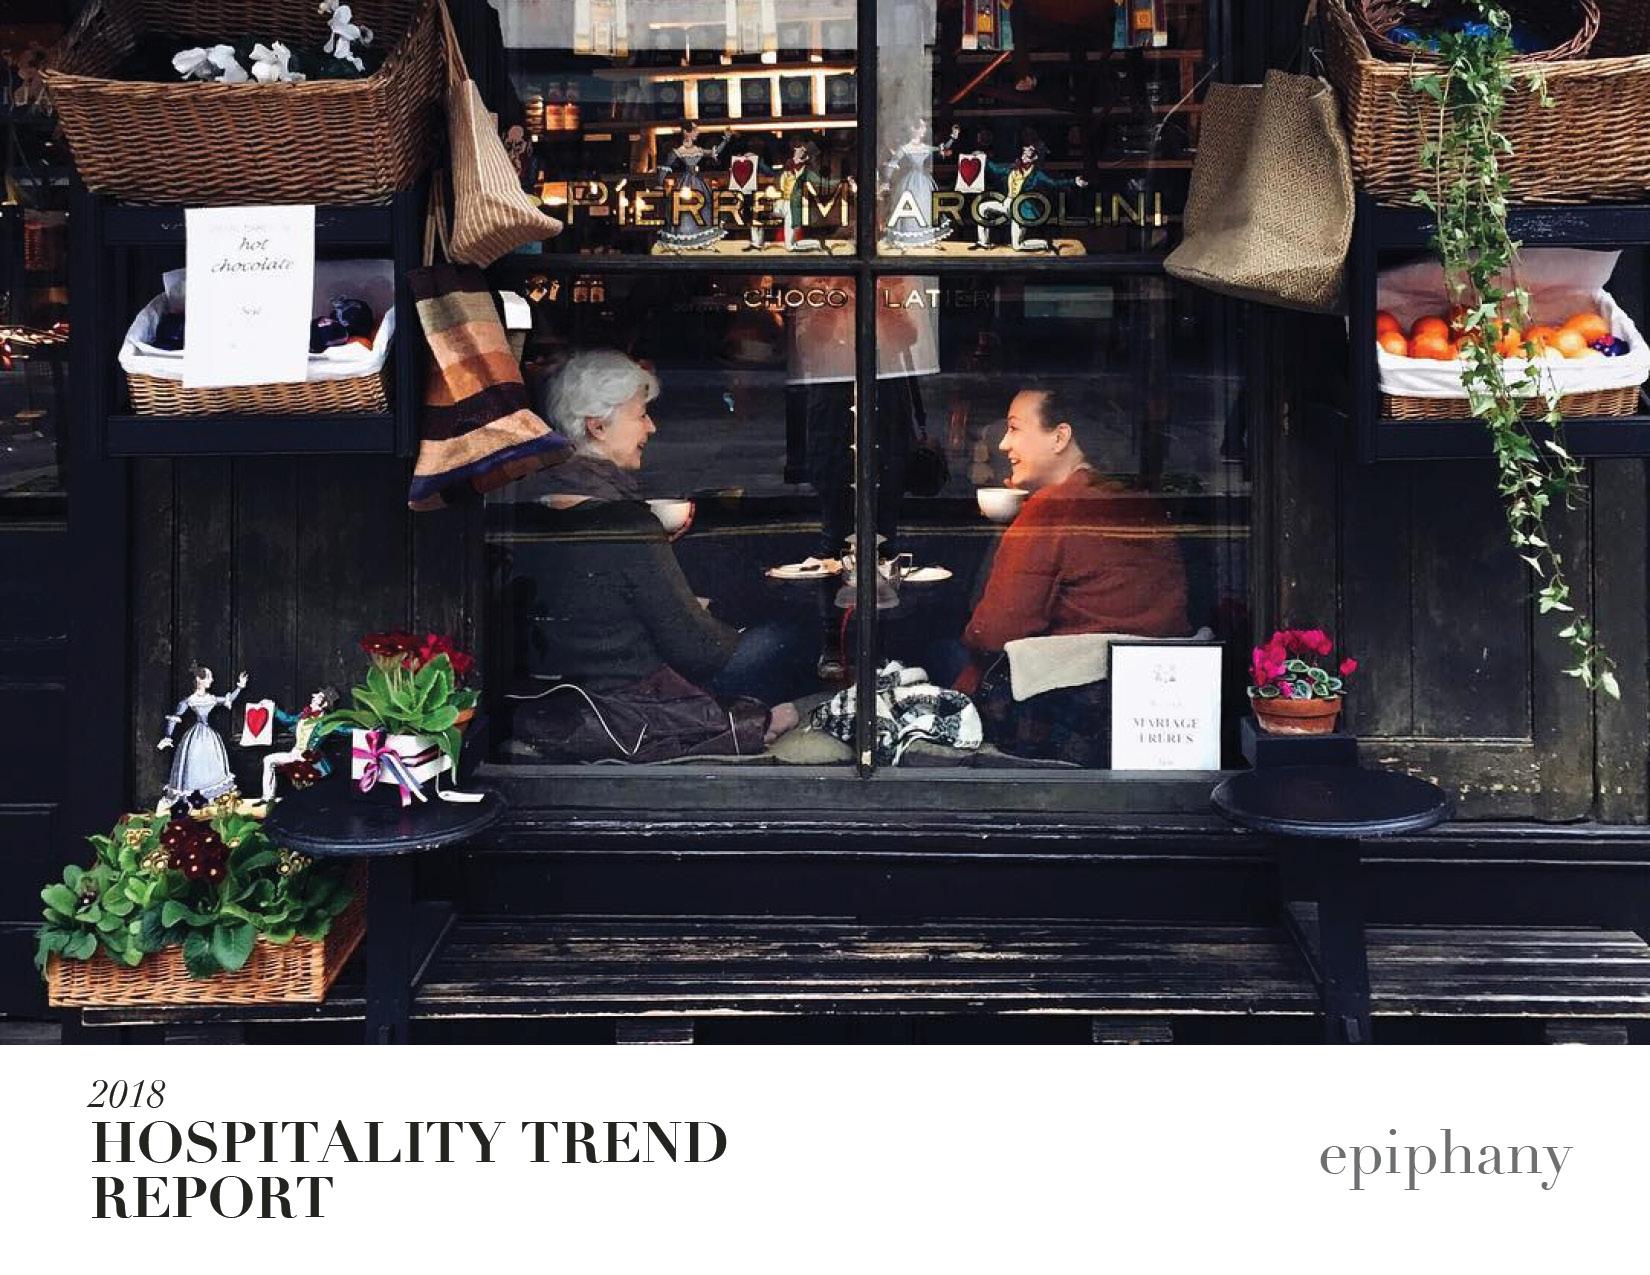 Epiphany-2018-Hospitality-Trend-Report